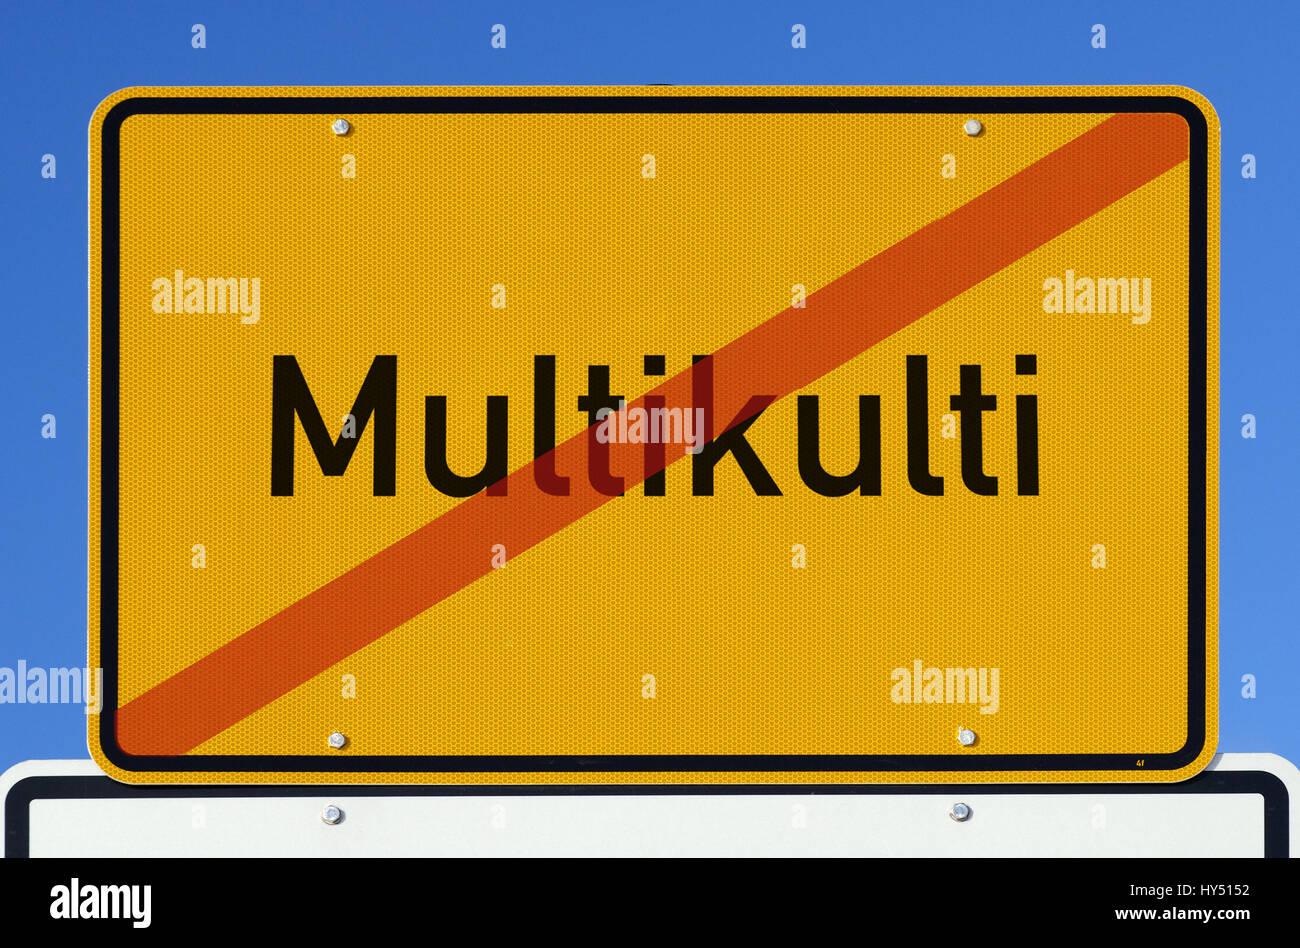 Local sign with crossed out stroke multiculturalism, Ortsschild mit durchgestrichenem Schriftzug Multikulti - Stock Image